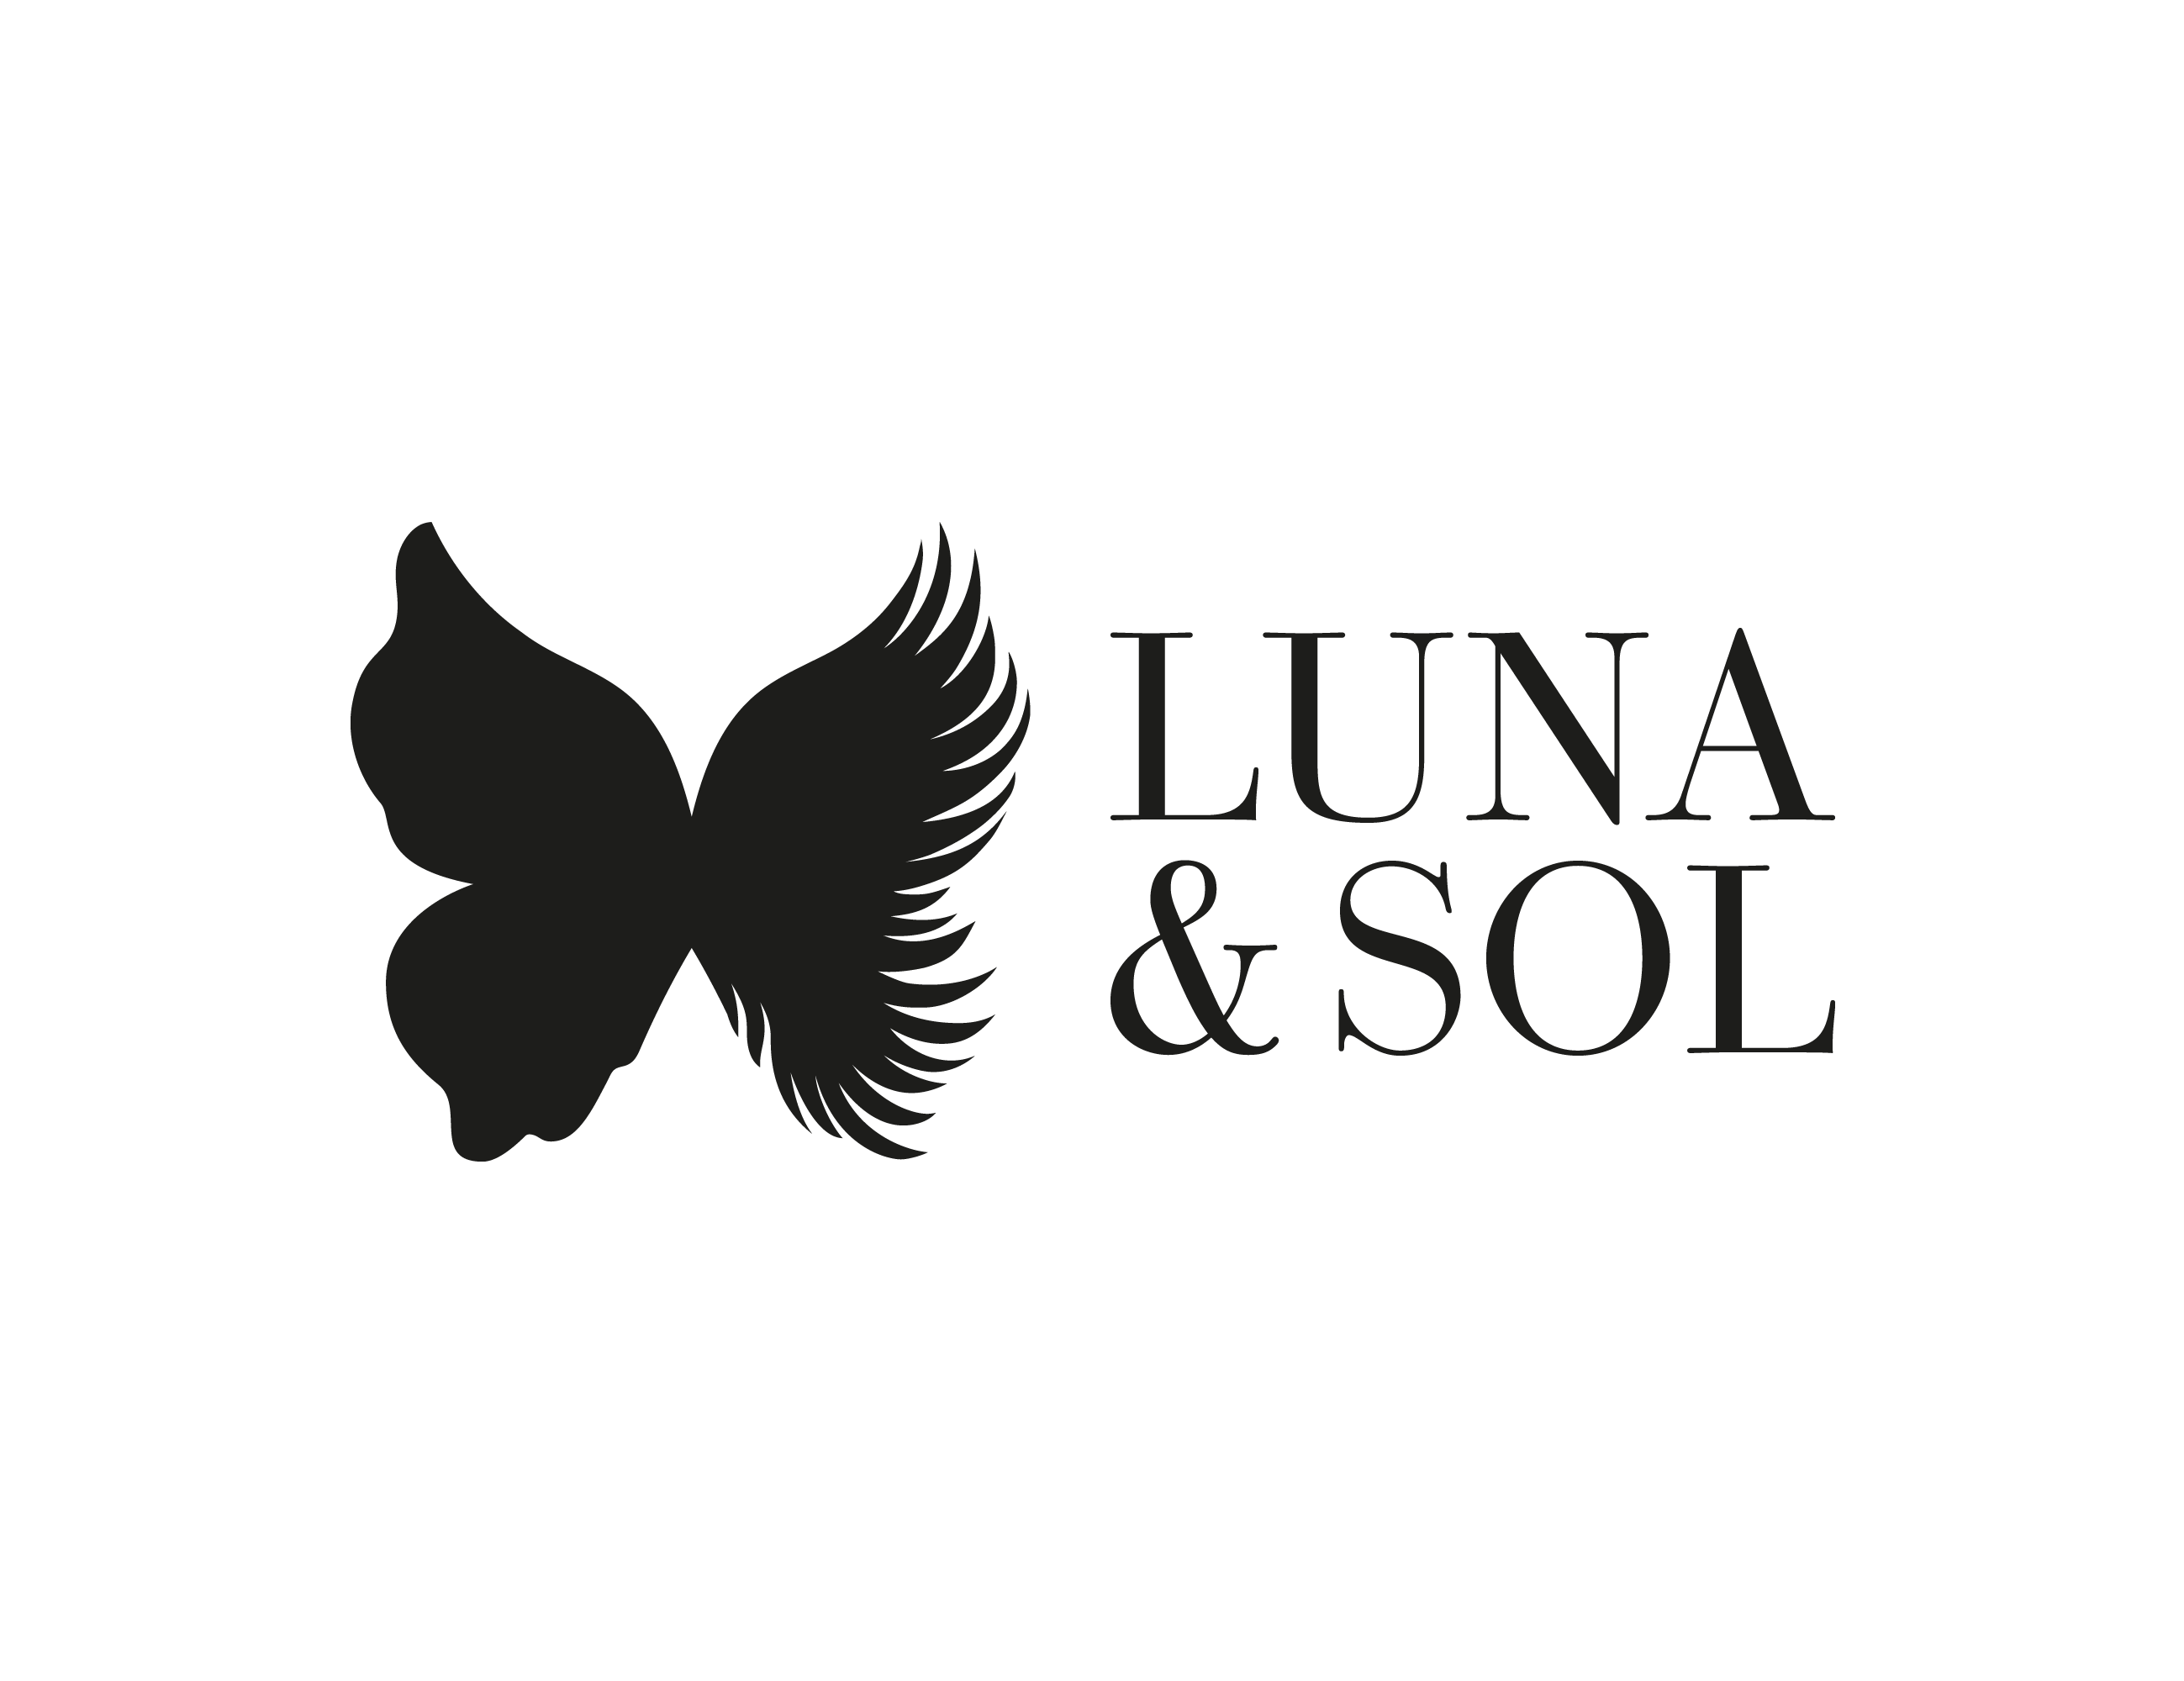 لونا & سول